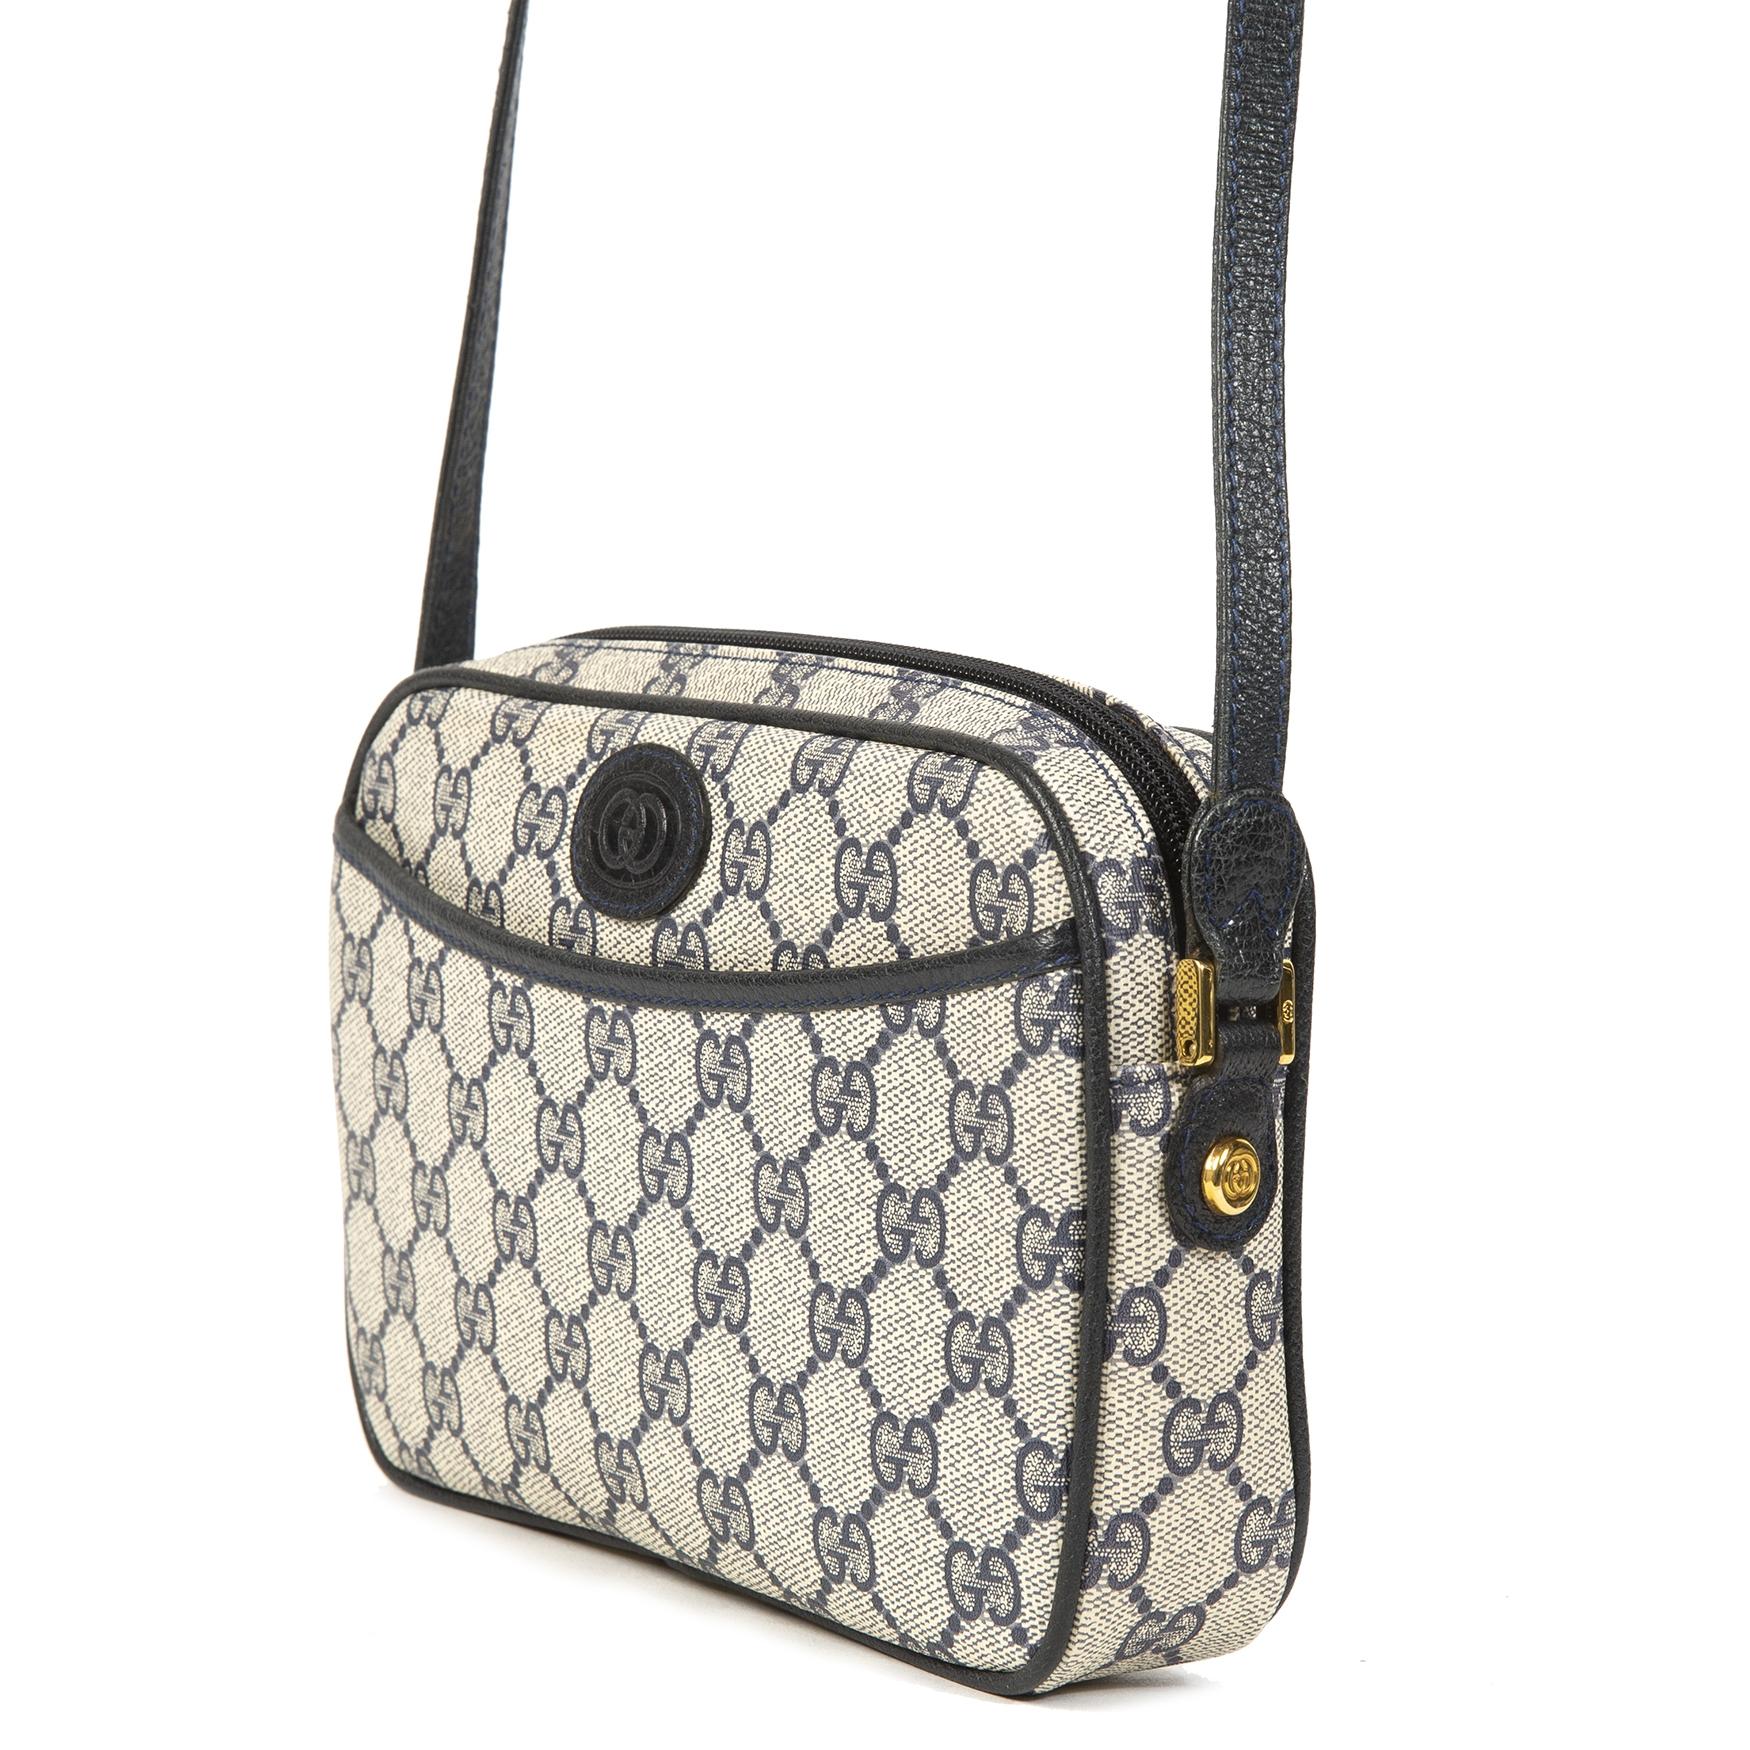 Gucci Blue Monogram Crossbody Bag